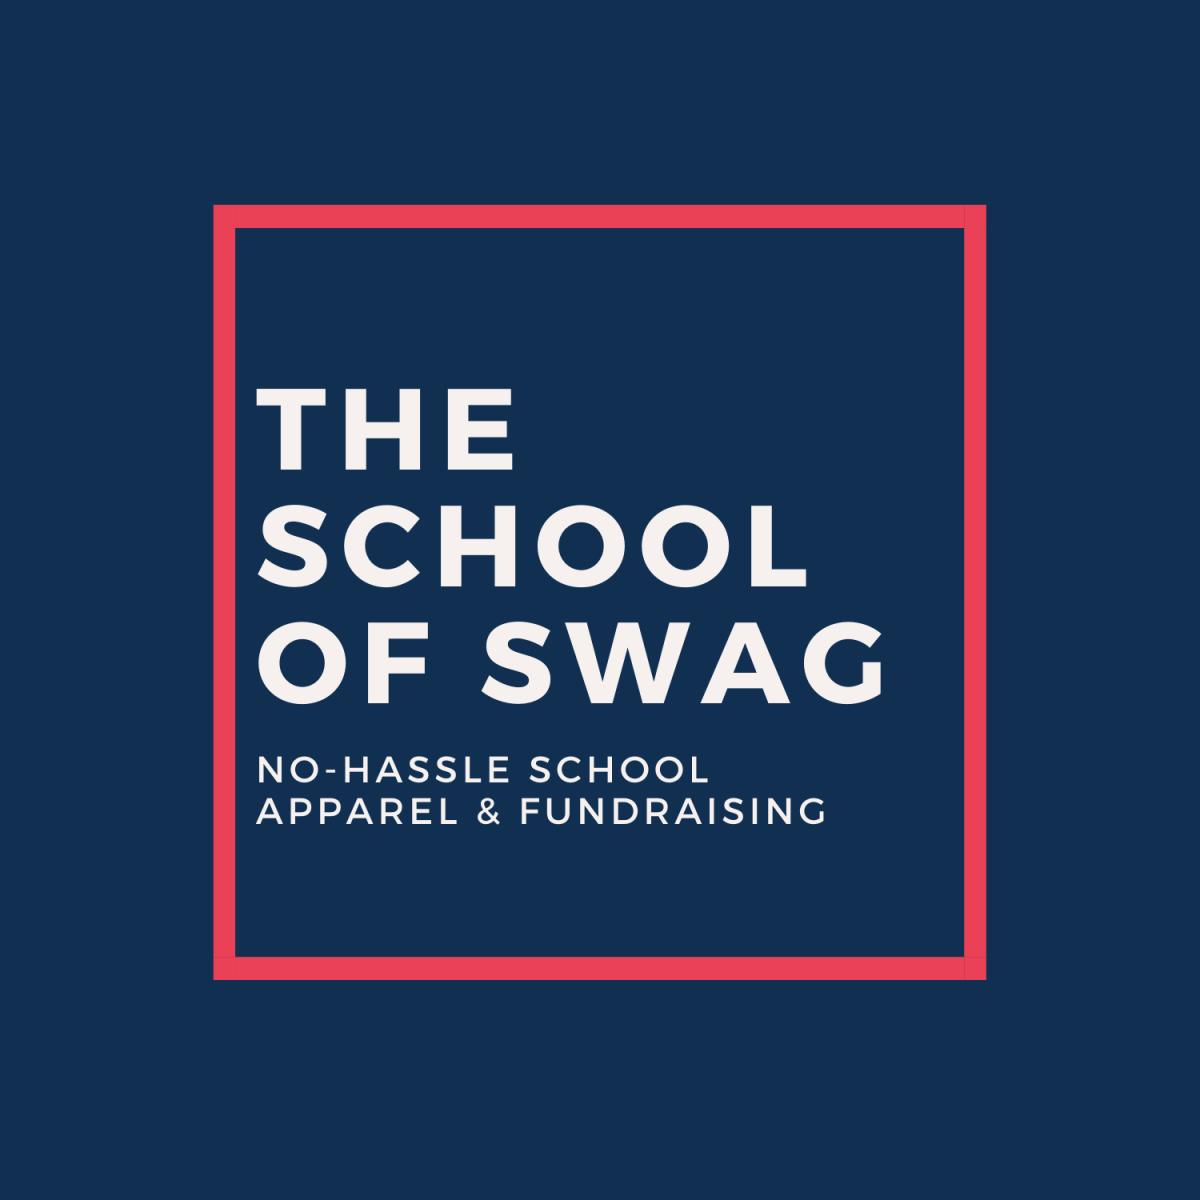 The School of Swag - No Hassle School Apparel & Fundraising